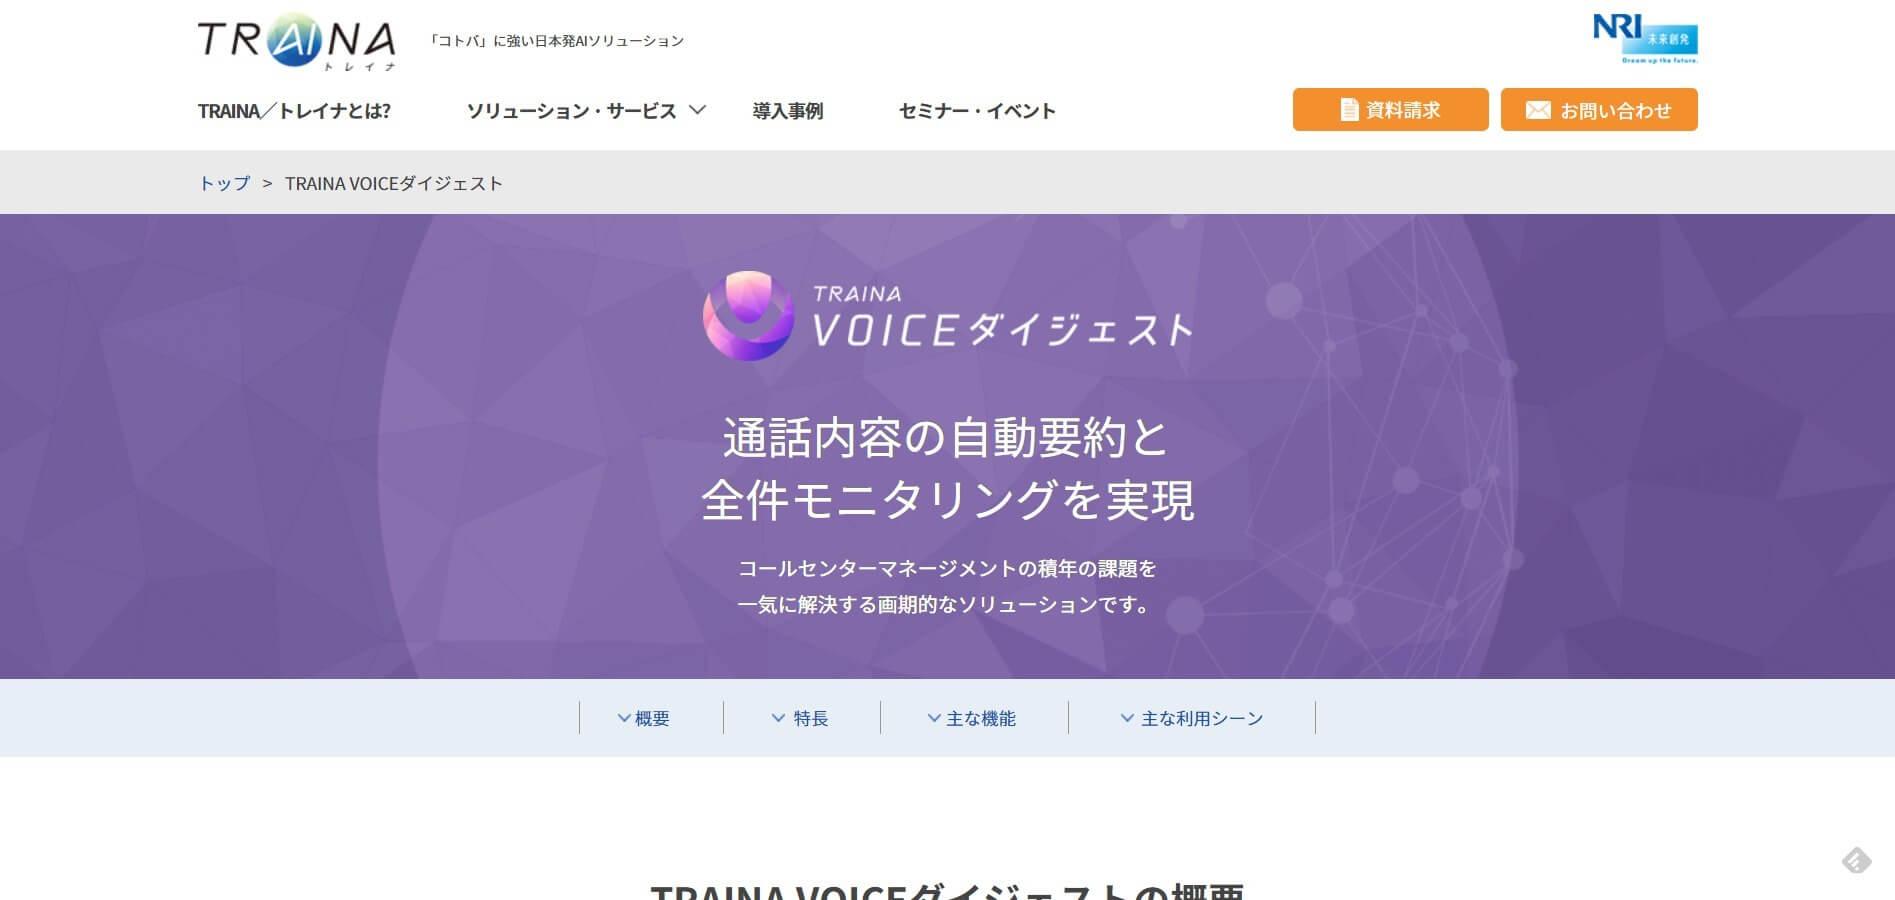 TRAINA VOICEダイジェスト(株式会社野村総合研究所)